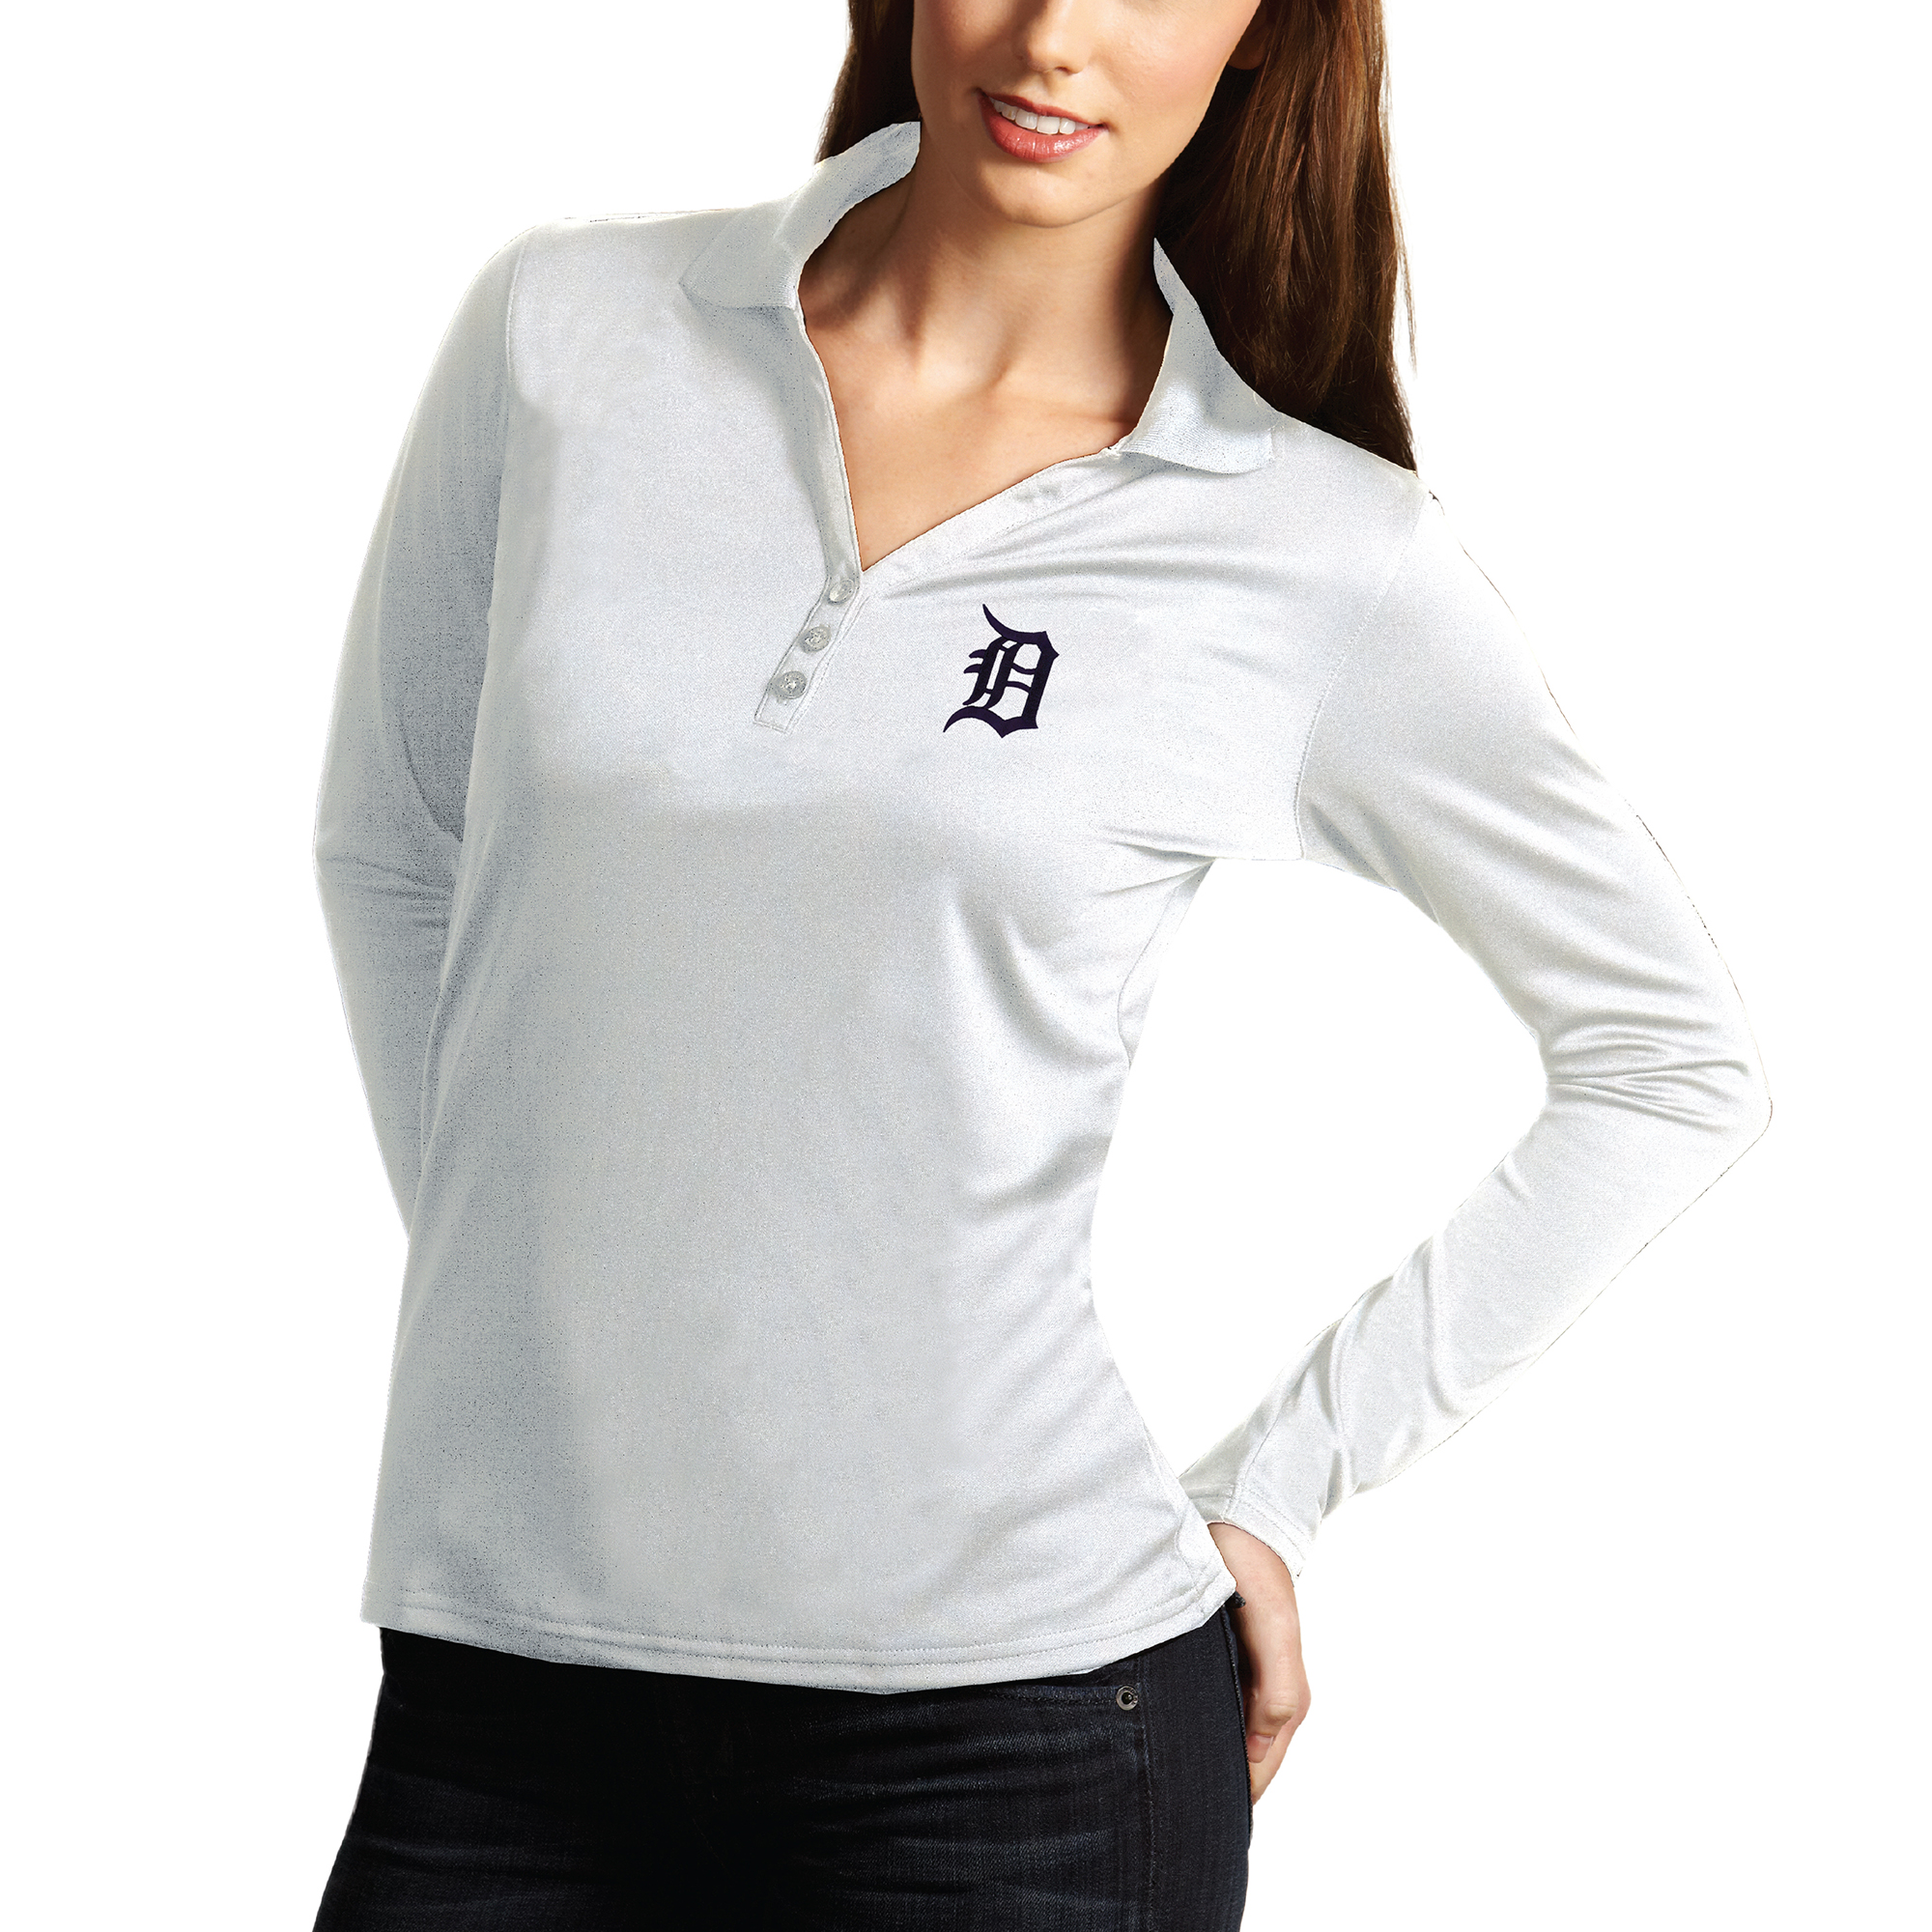 Detroit Tigers Antigua Women's Desert Dry Xtra Lite Exceed Long Sleeve Polo - White